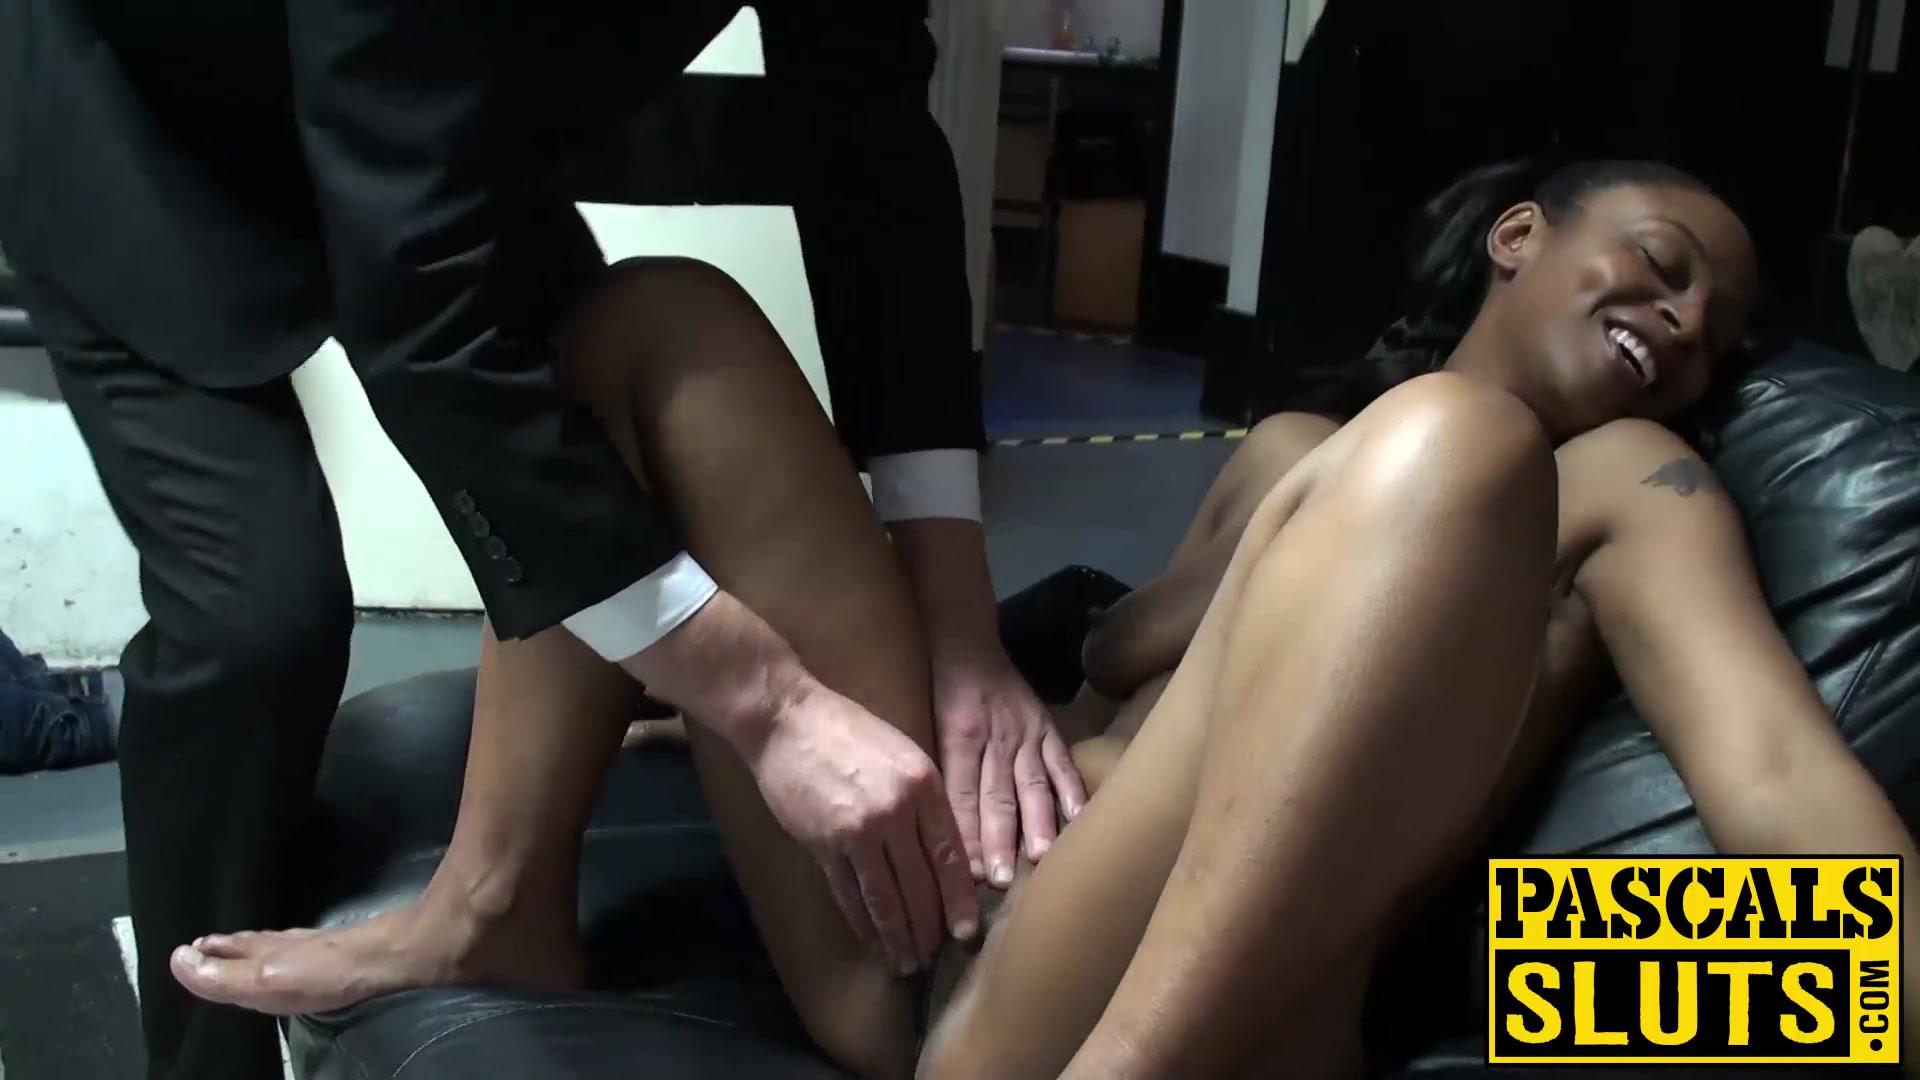 indianporno com Naked xXx